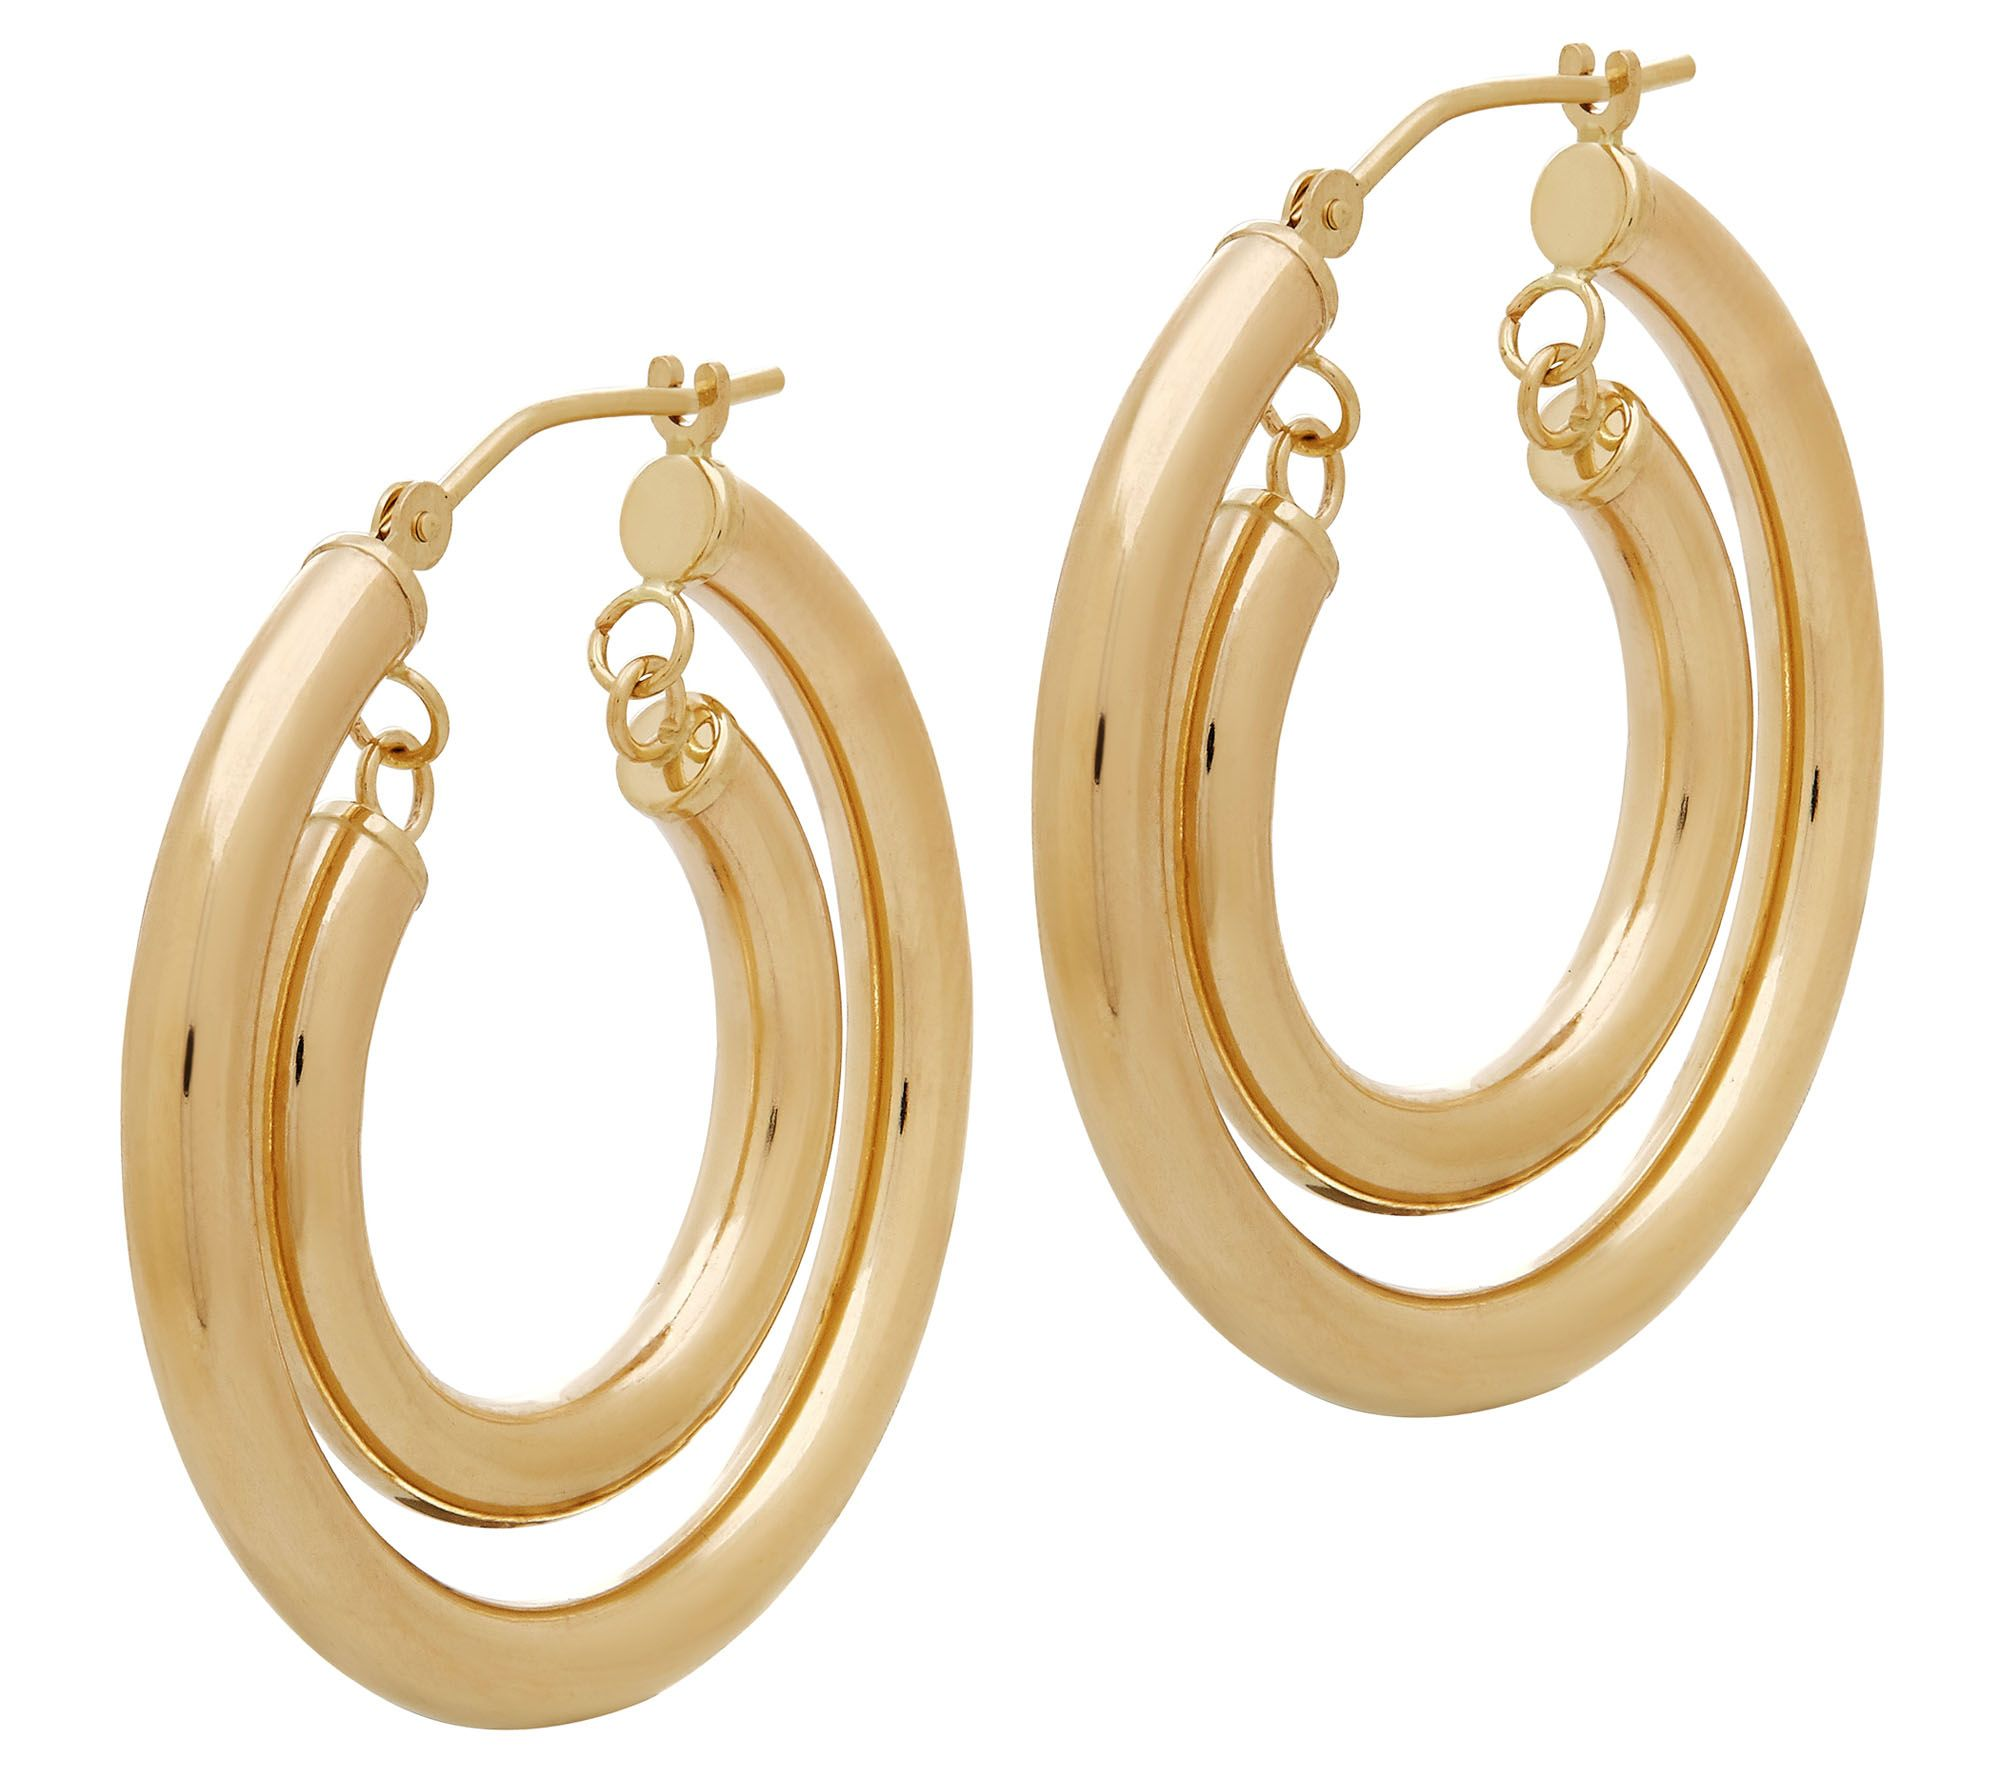 California Gold RushR Sale Gold Jewelry QVCcom